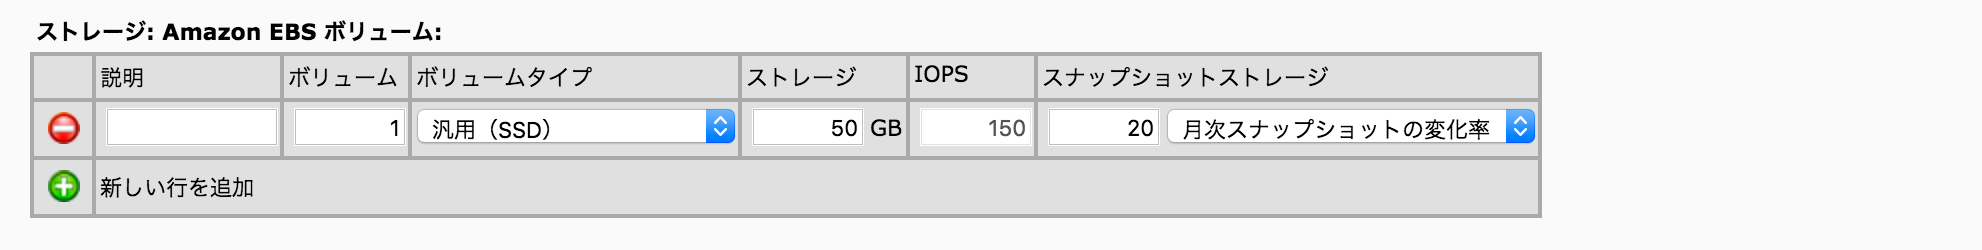 Calculator006